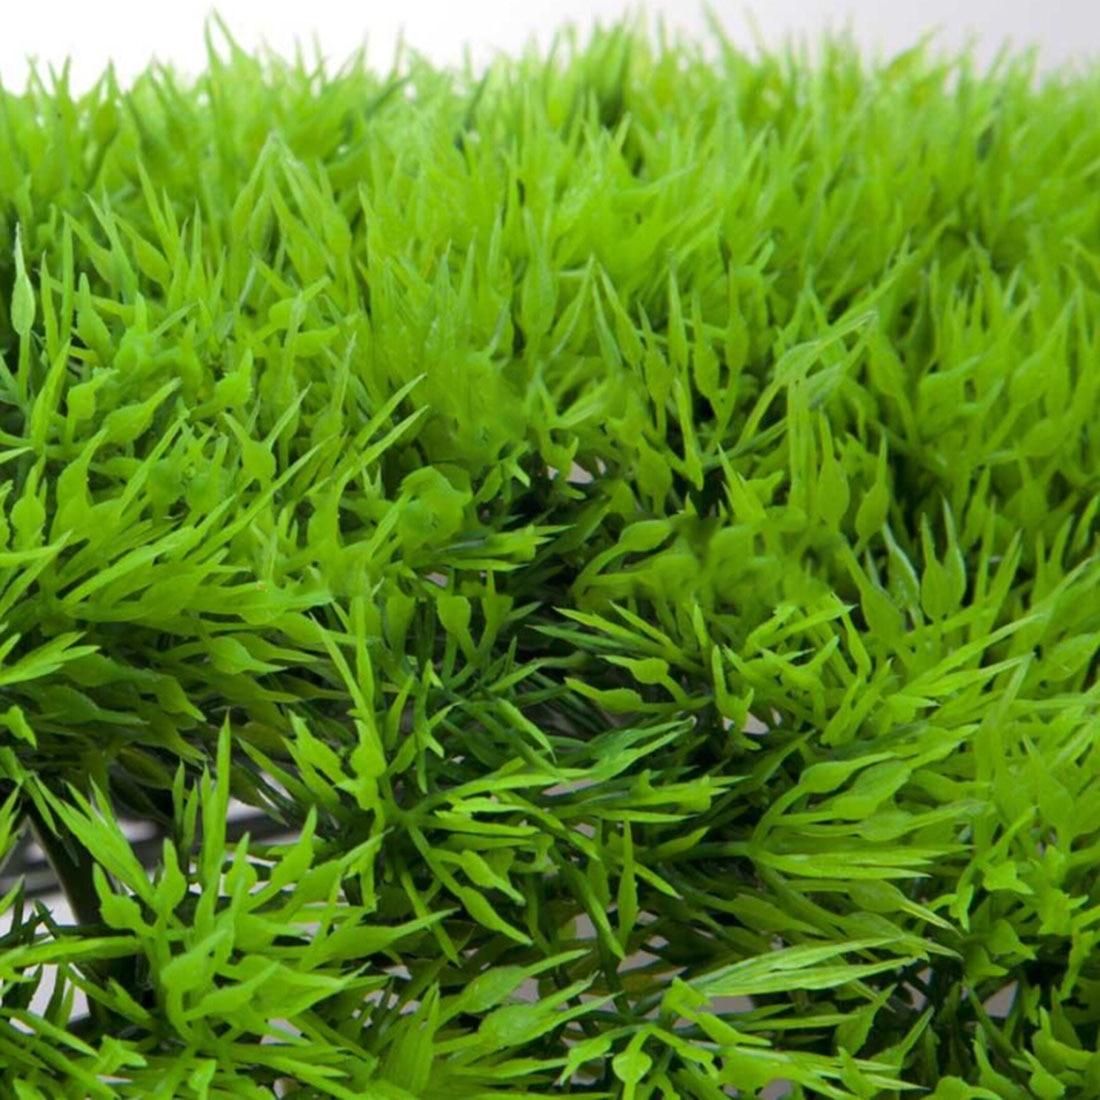 Top Sale Artificial Plastic Lawn Water Aquatic Grass Plant Fish Tank Landscape Underwater Beautiful Water Plant Ornament